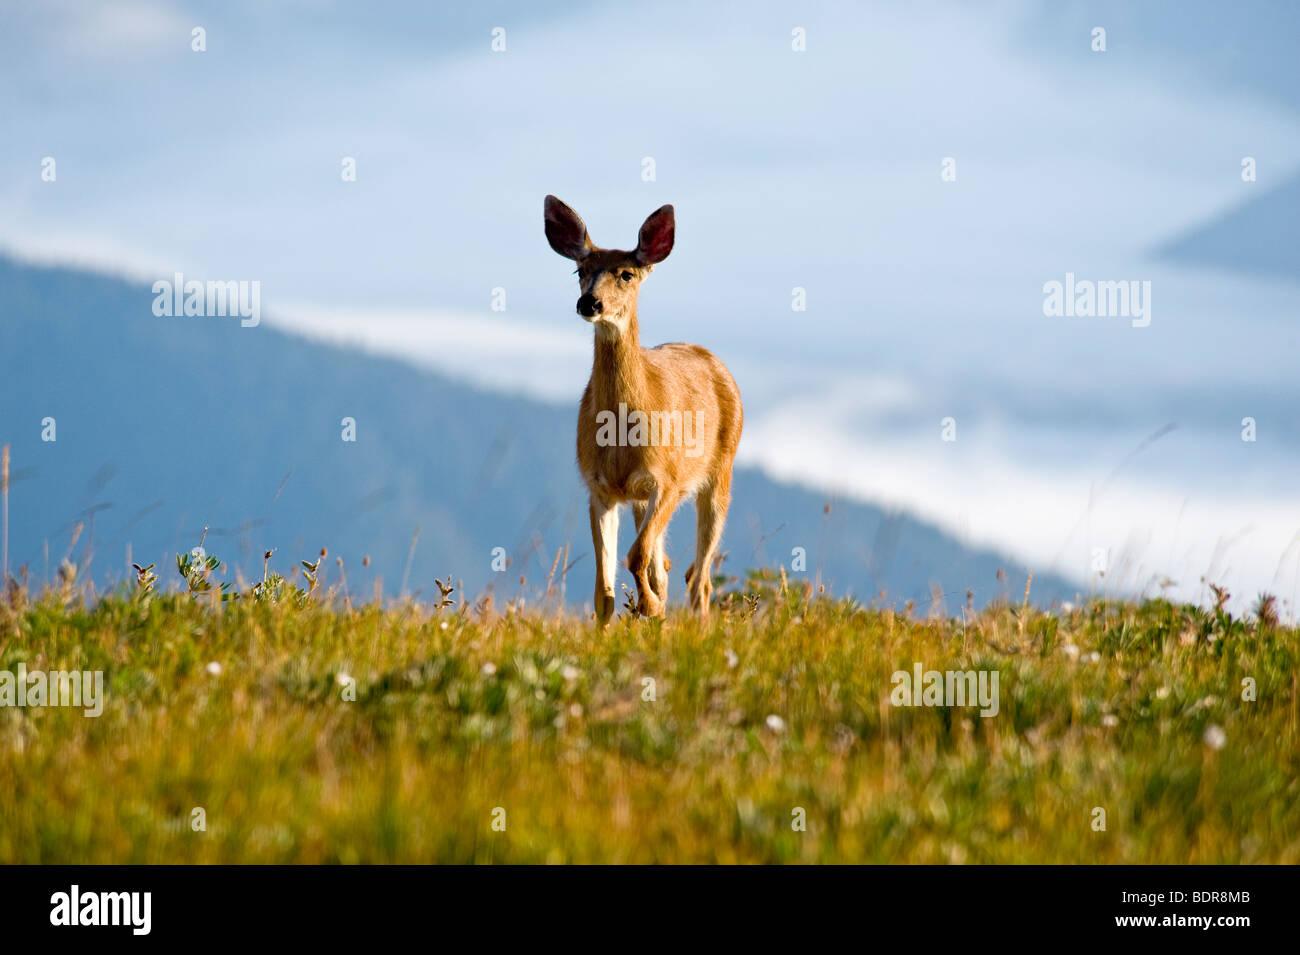 Deer at Hurricane Ridge, Olympic National Park, Washington, USA - Stock Image